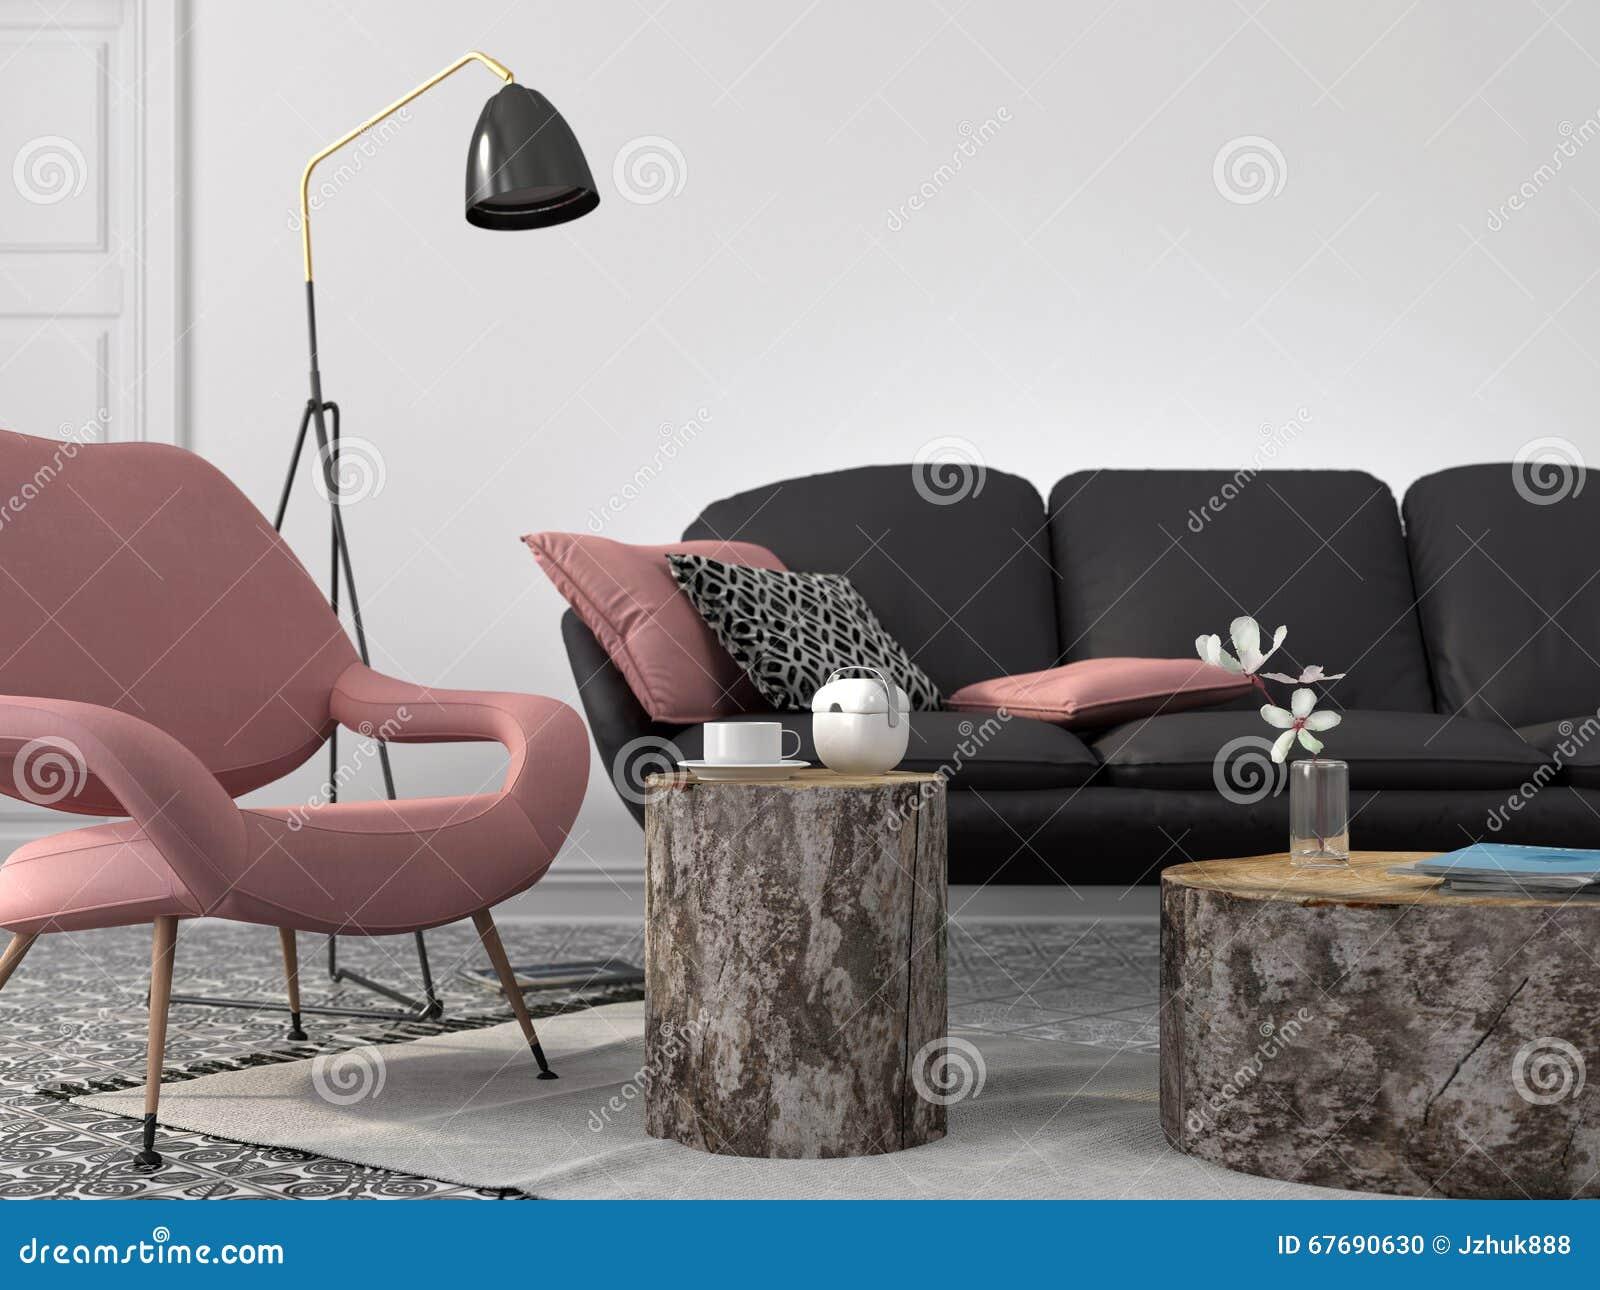 Modieuze Woonkamer In Roze En Grijze Kleur Stock Illustratie ...